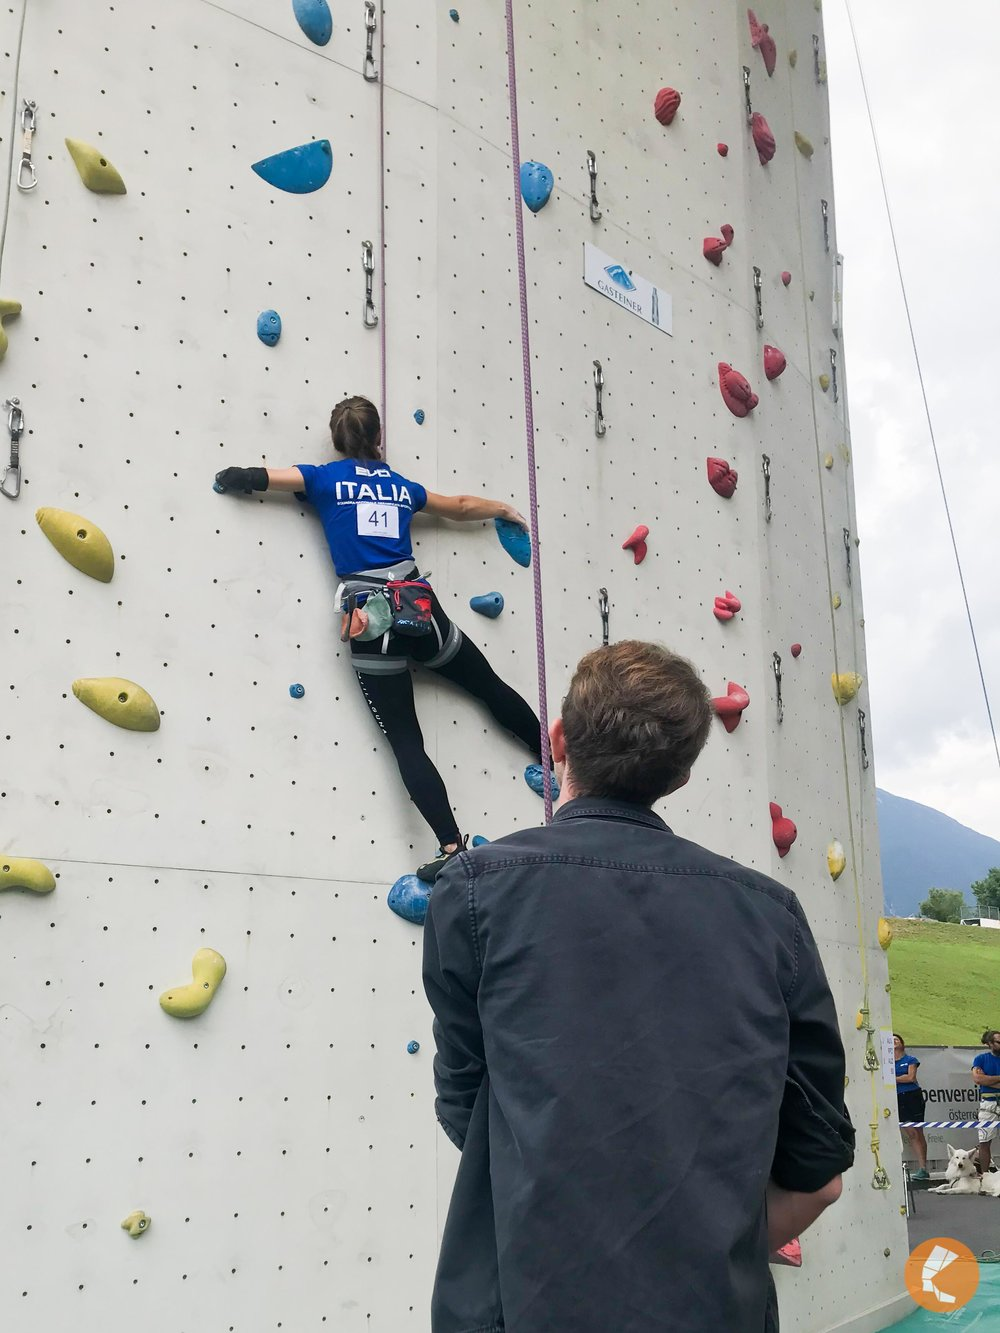 Strong Italian climber